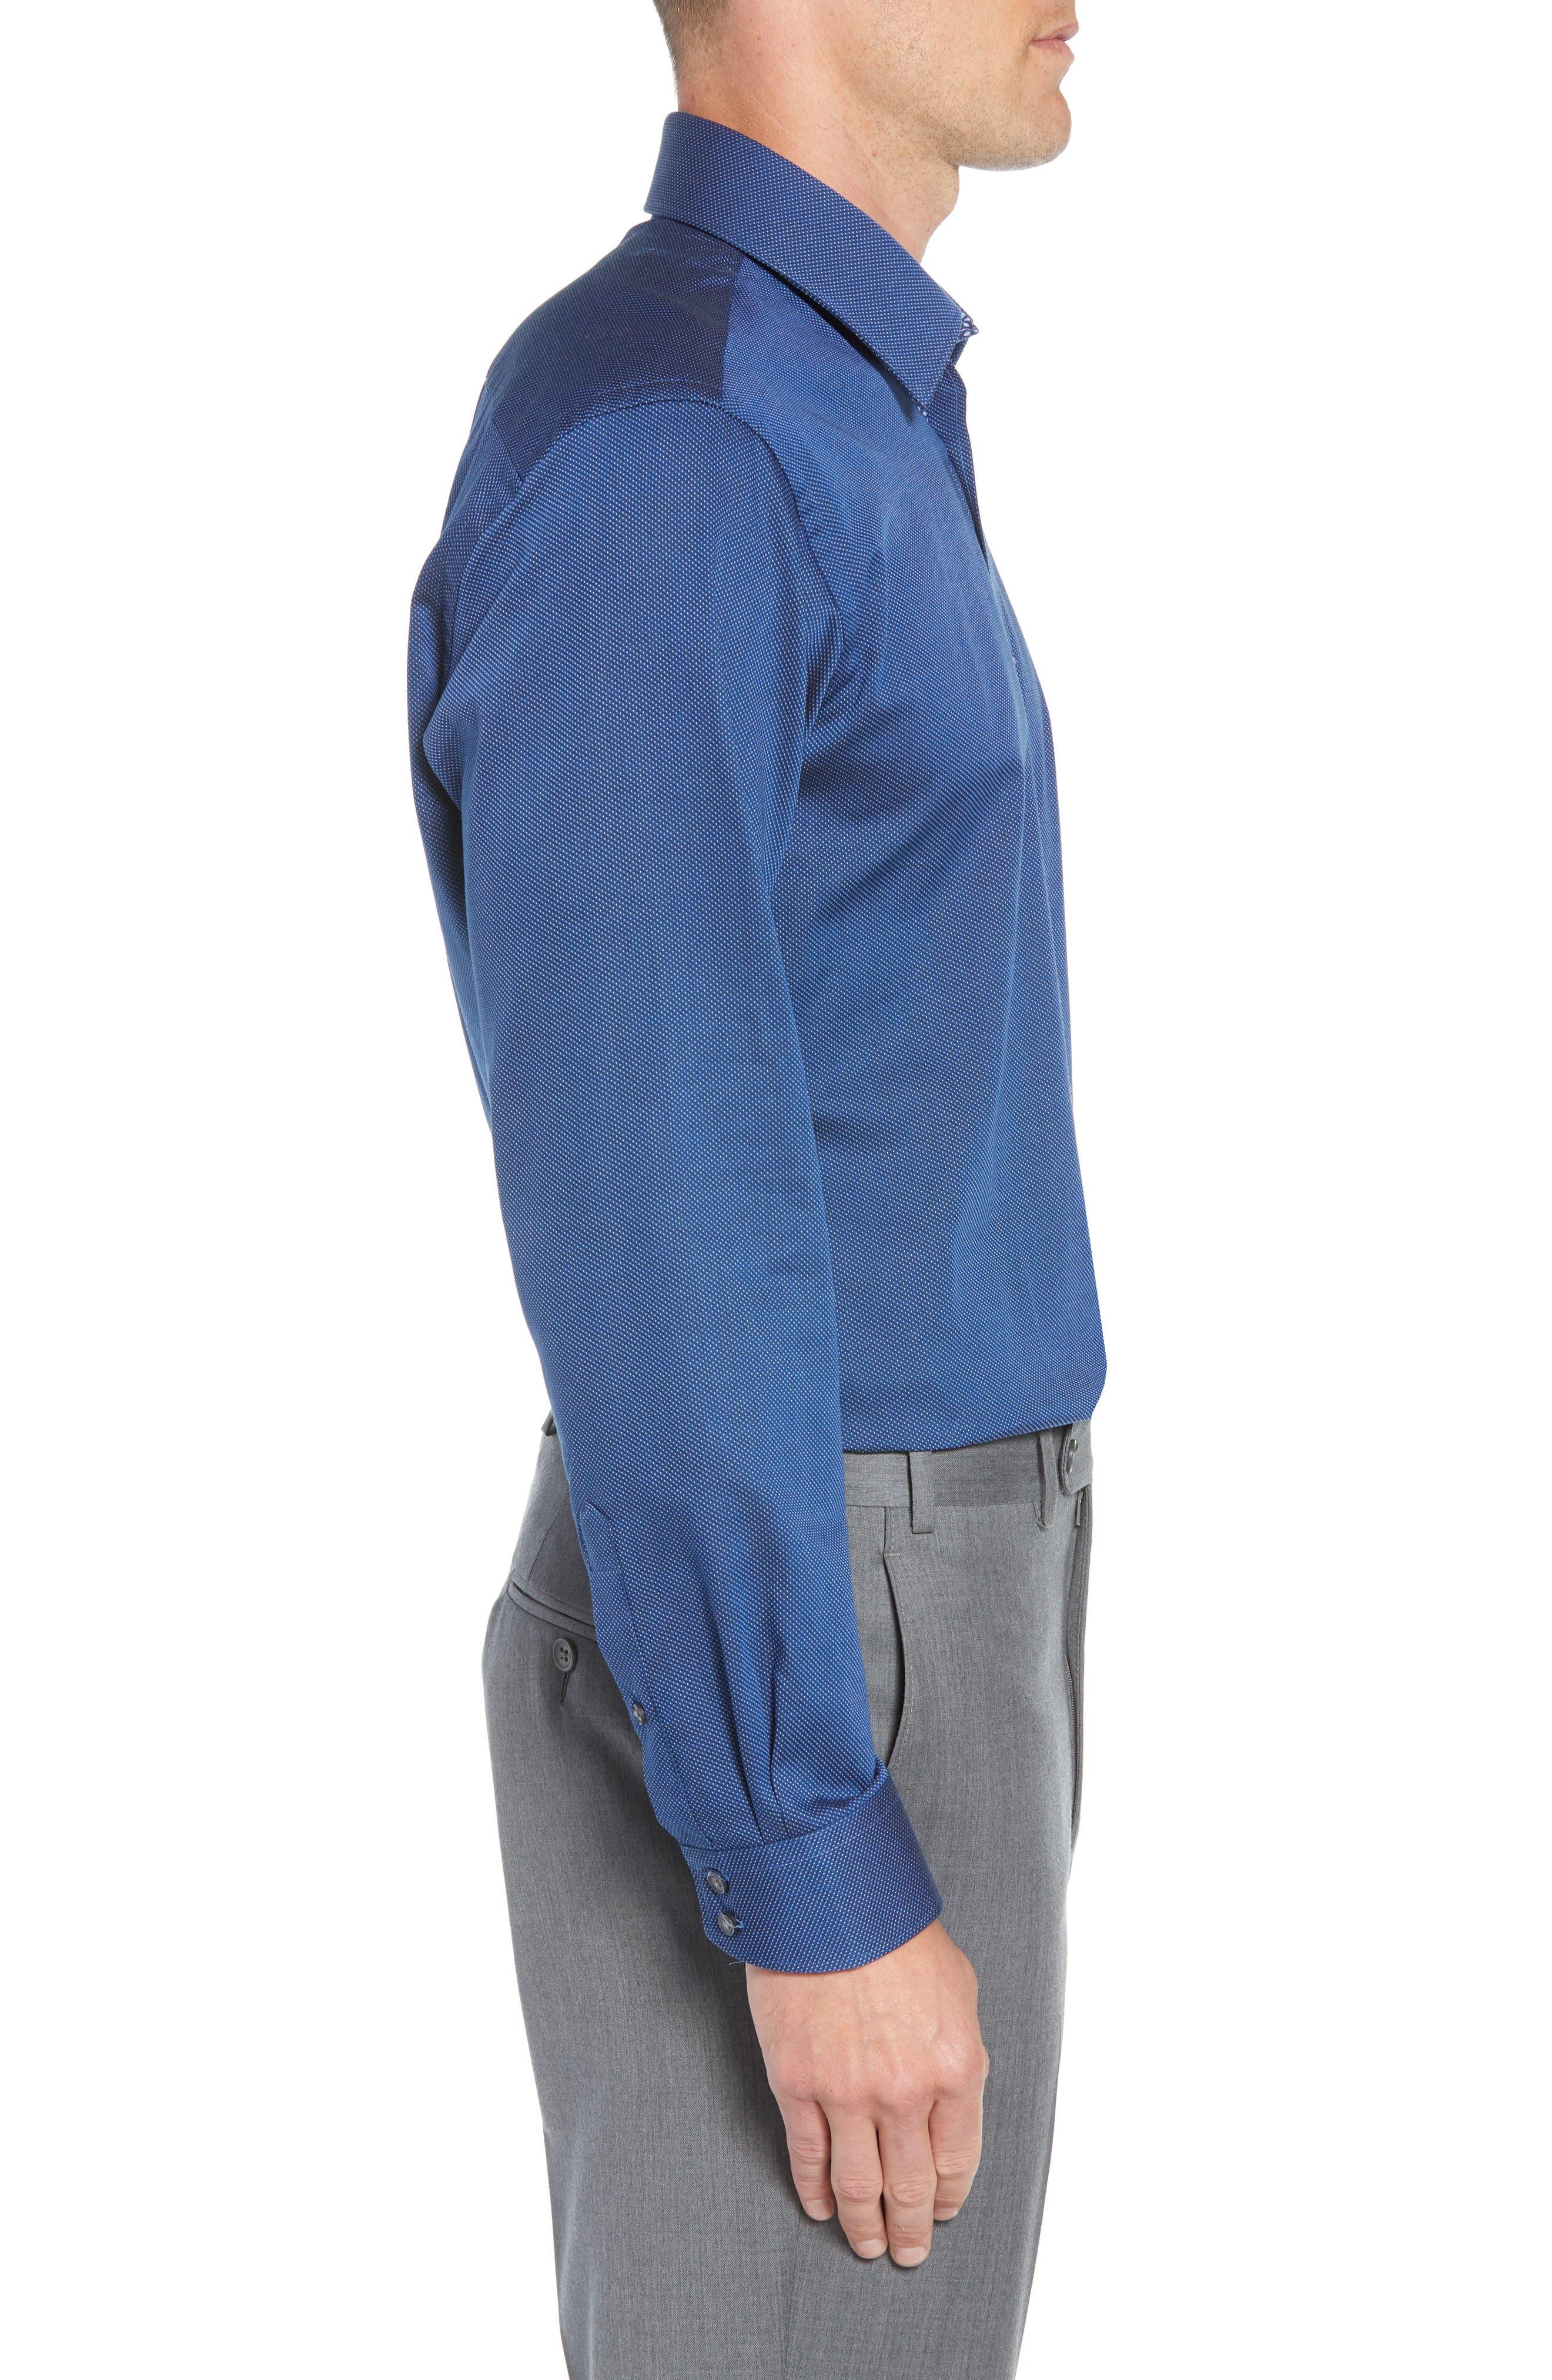 TED BAKER LONDON,                             Wikks Slim Fit Print Dress Shirt,                             Alternate thumbnail 4, color,                             410